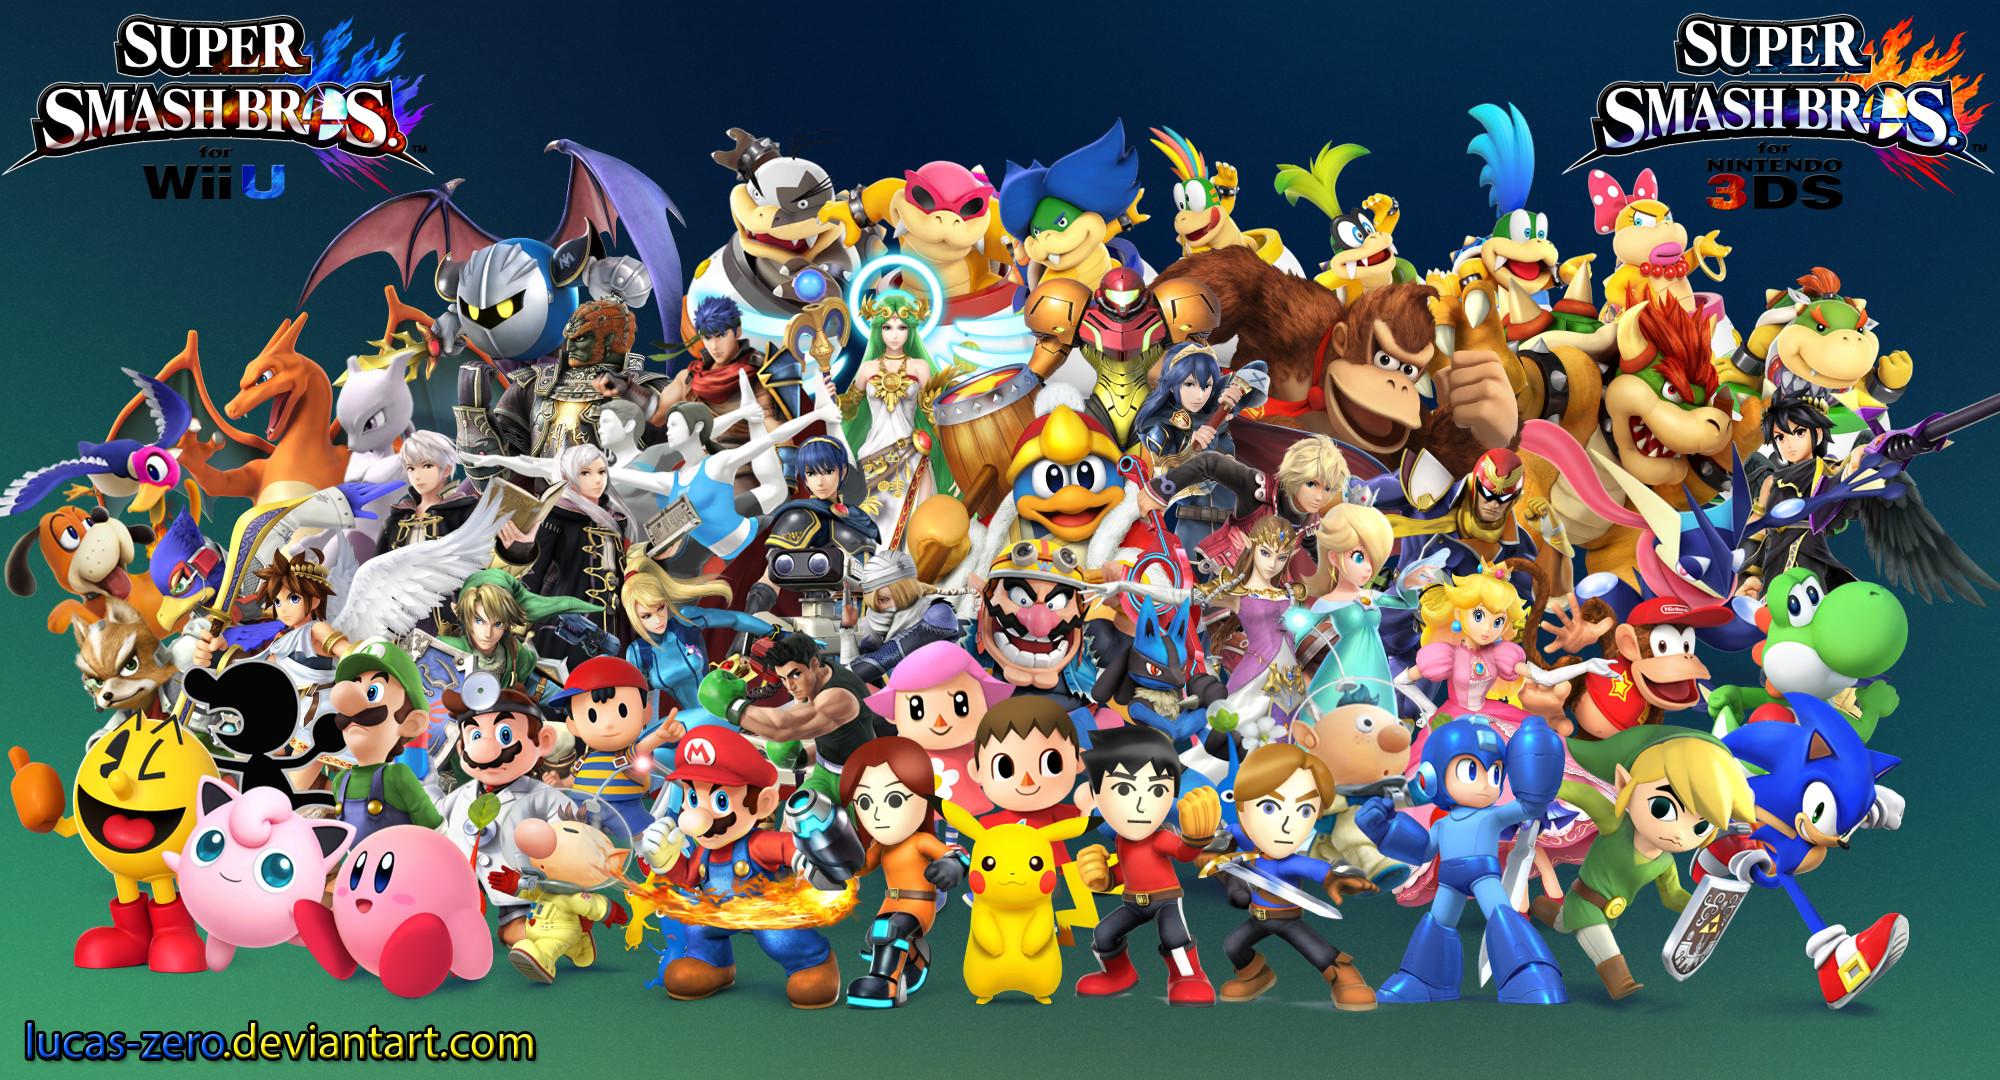 Hd Wallpapers Super Smash Bros 1600 X 1200 609 Kb Jpeg | HD Wallpapers .